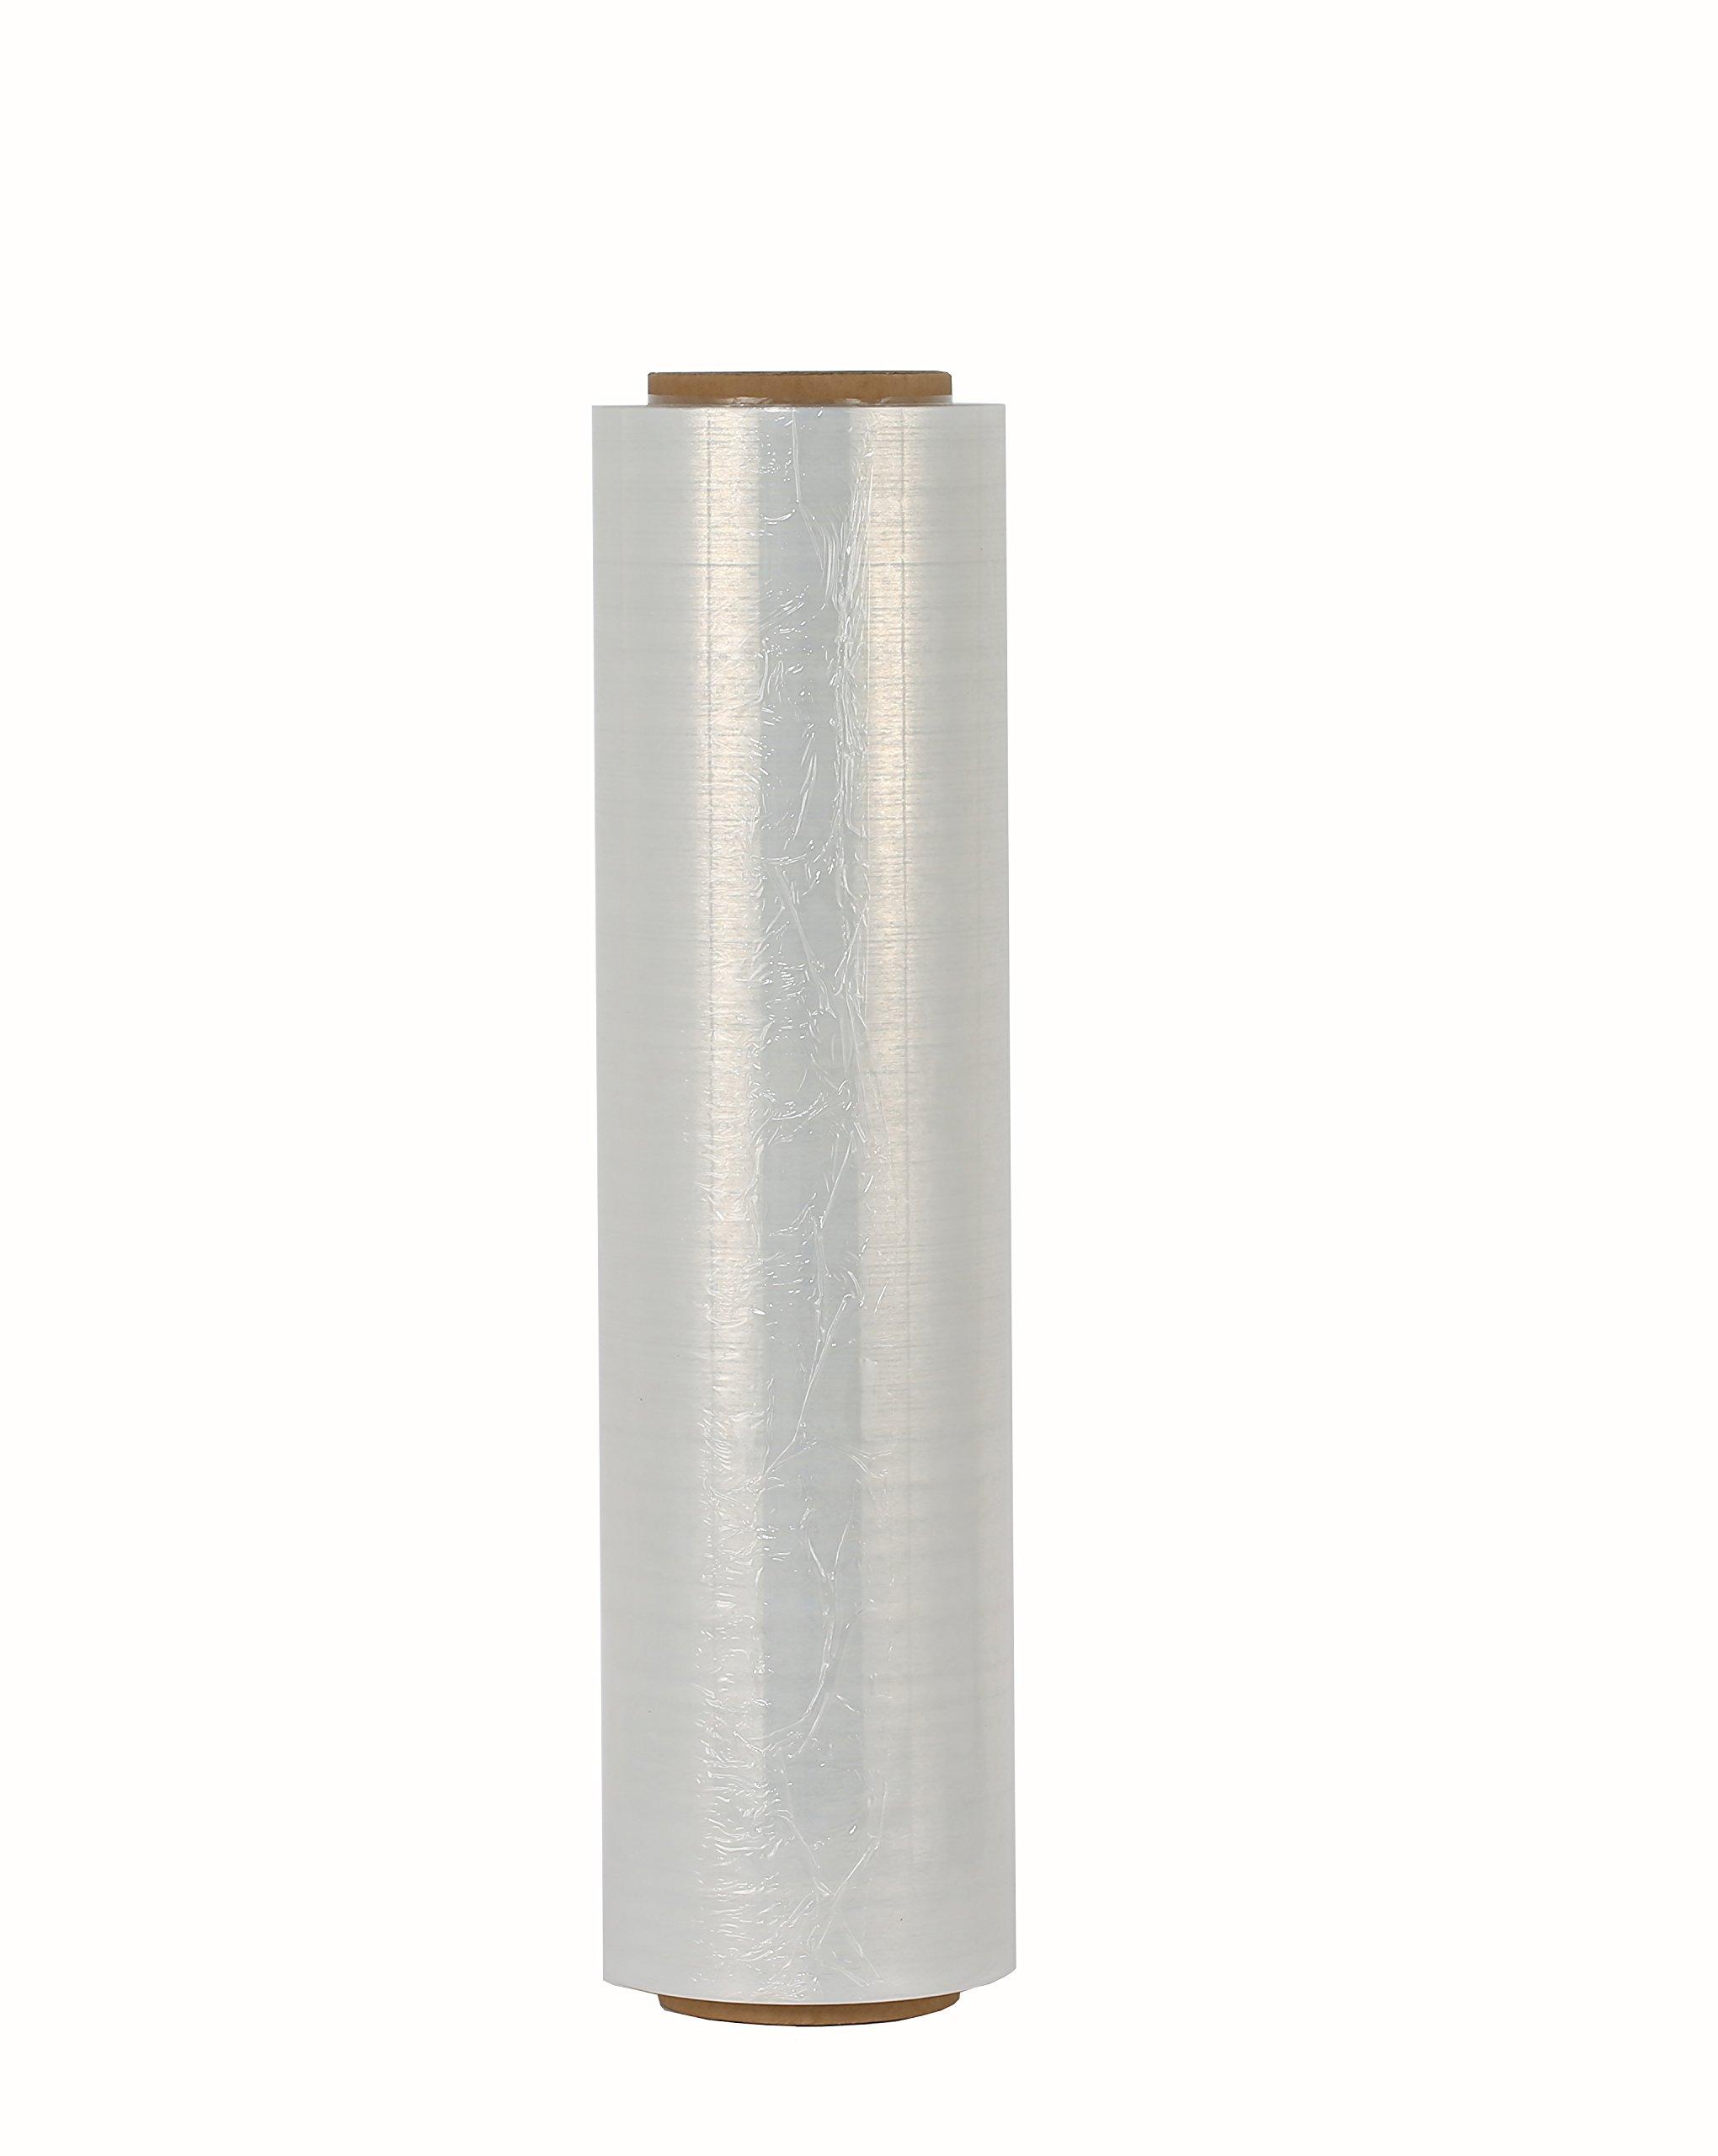 MuzGlobal Cast Stretch Wrap Film-1000 Length x 18'' Width Clear 80 gauge. (Pack of 4) by MuzGlobal